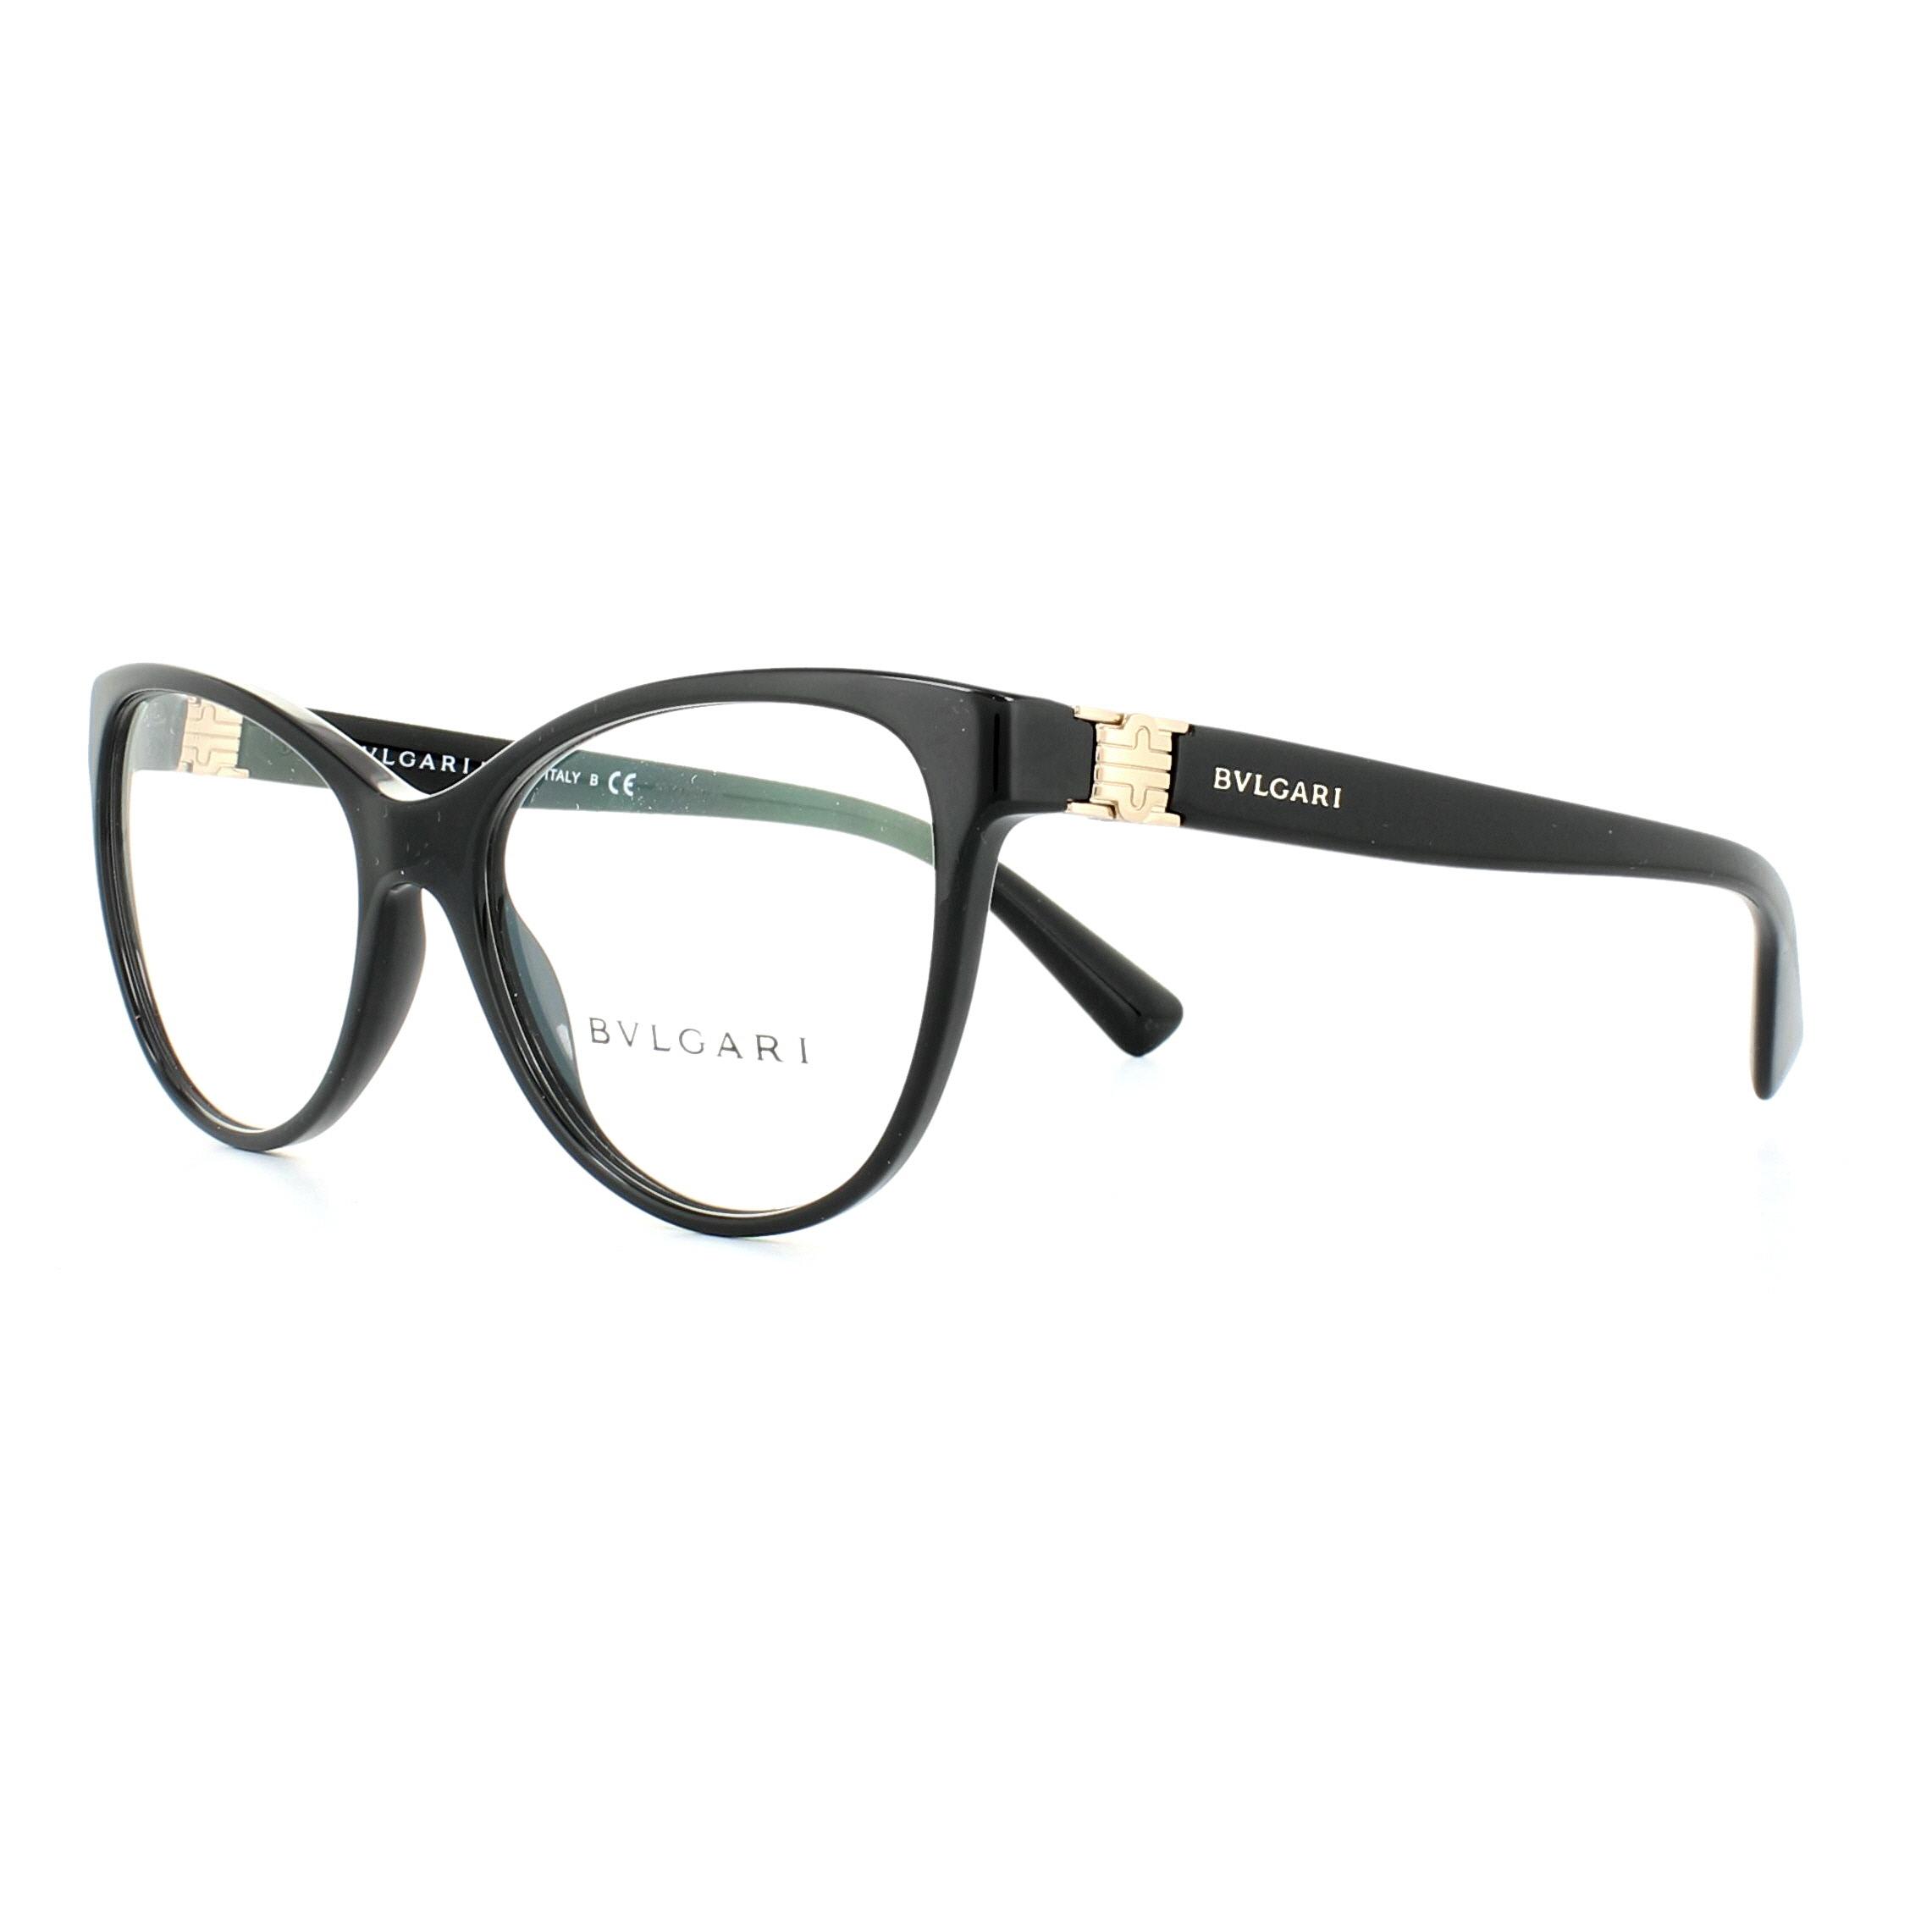 7a2fa18f5a Bvlgari Glasses Frames 4151 501 Black 52mm Womens 8053672811742